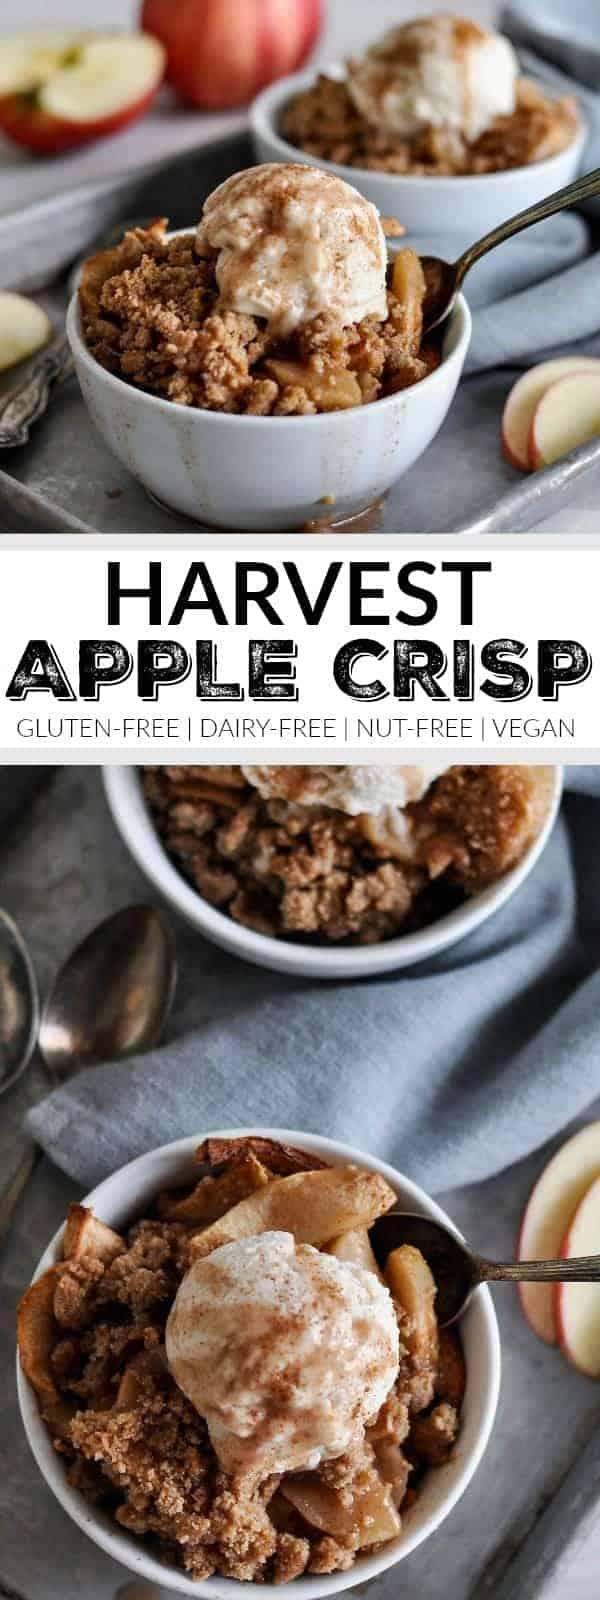 Gluten-free Harvest Apple Crisp | gluten-free fall desserts | gluten-free dessert recipes | gluten-free apple recipes | dairy-free fall desserts | dairy-free dessert recipes | dairy-free apple recipes | nut-free fall desserts | nut-free apple recipes | nut-free dessert recipes | vegan fall desserts | vegan dessert recipes | vegan apple recipes || The Real Food Dietitians